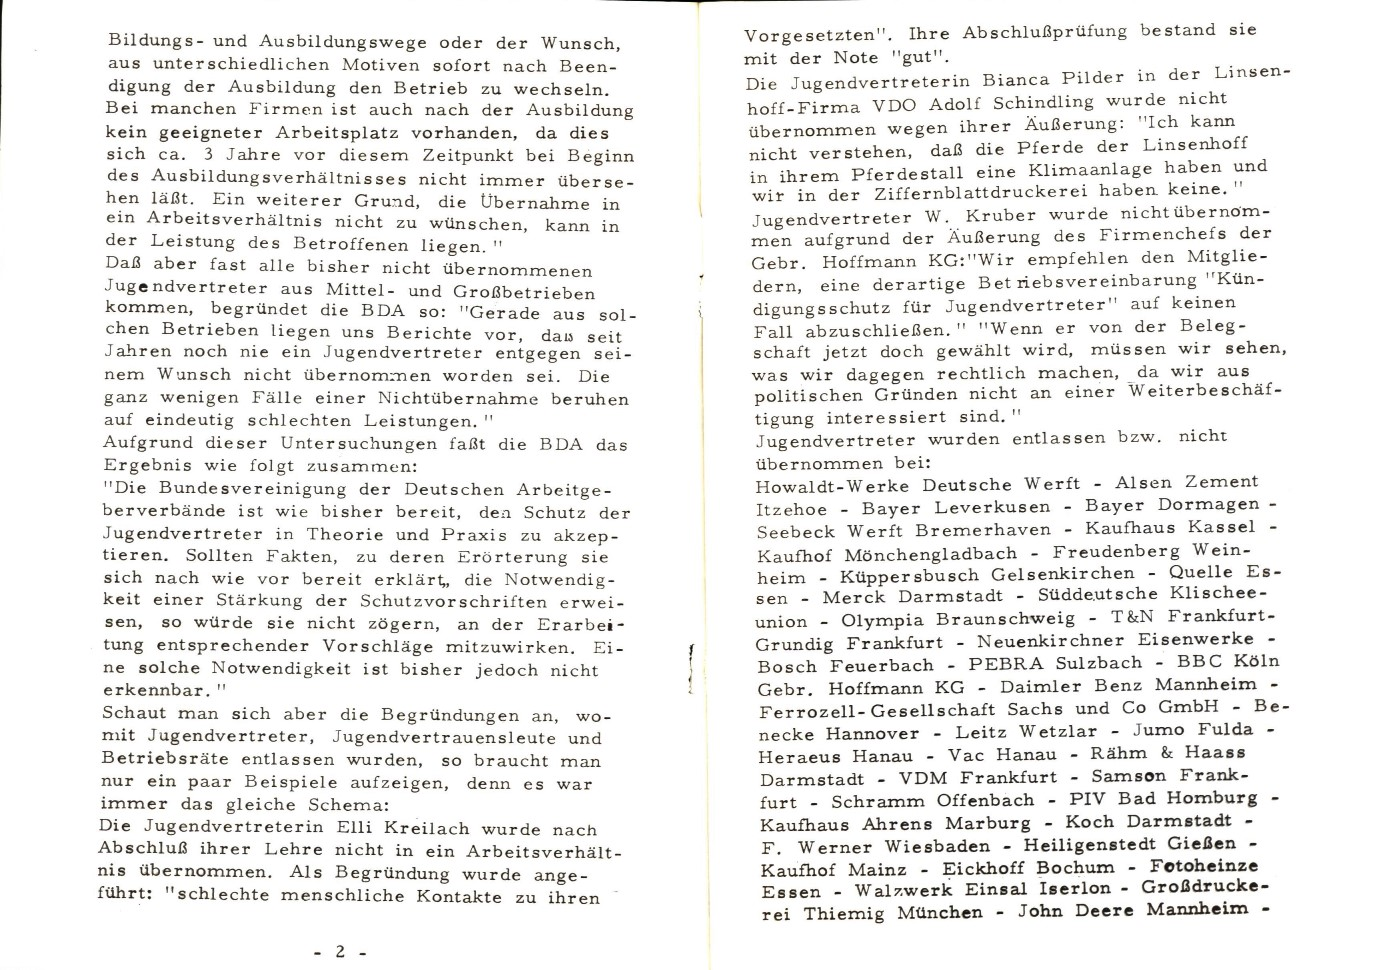 KJV_1973_NK_Arbeiterjugend_03